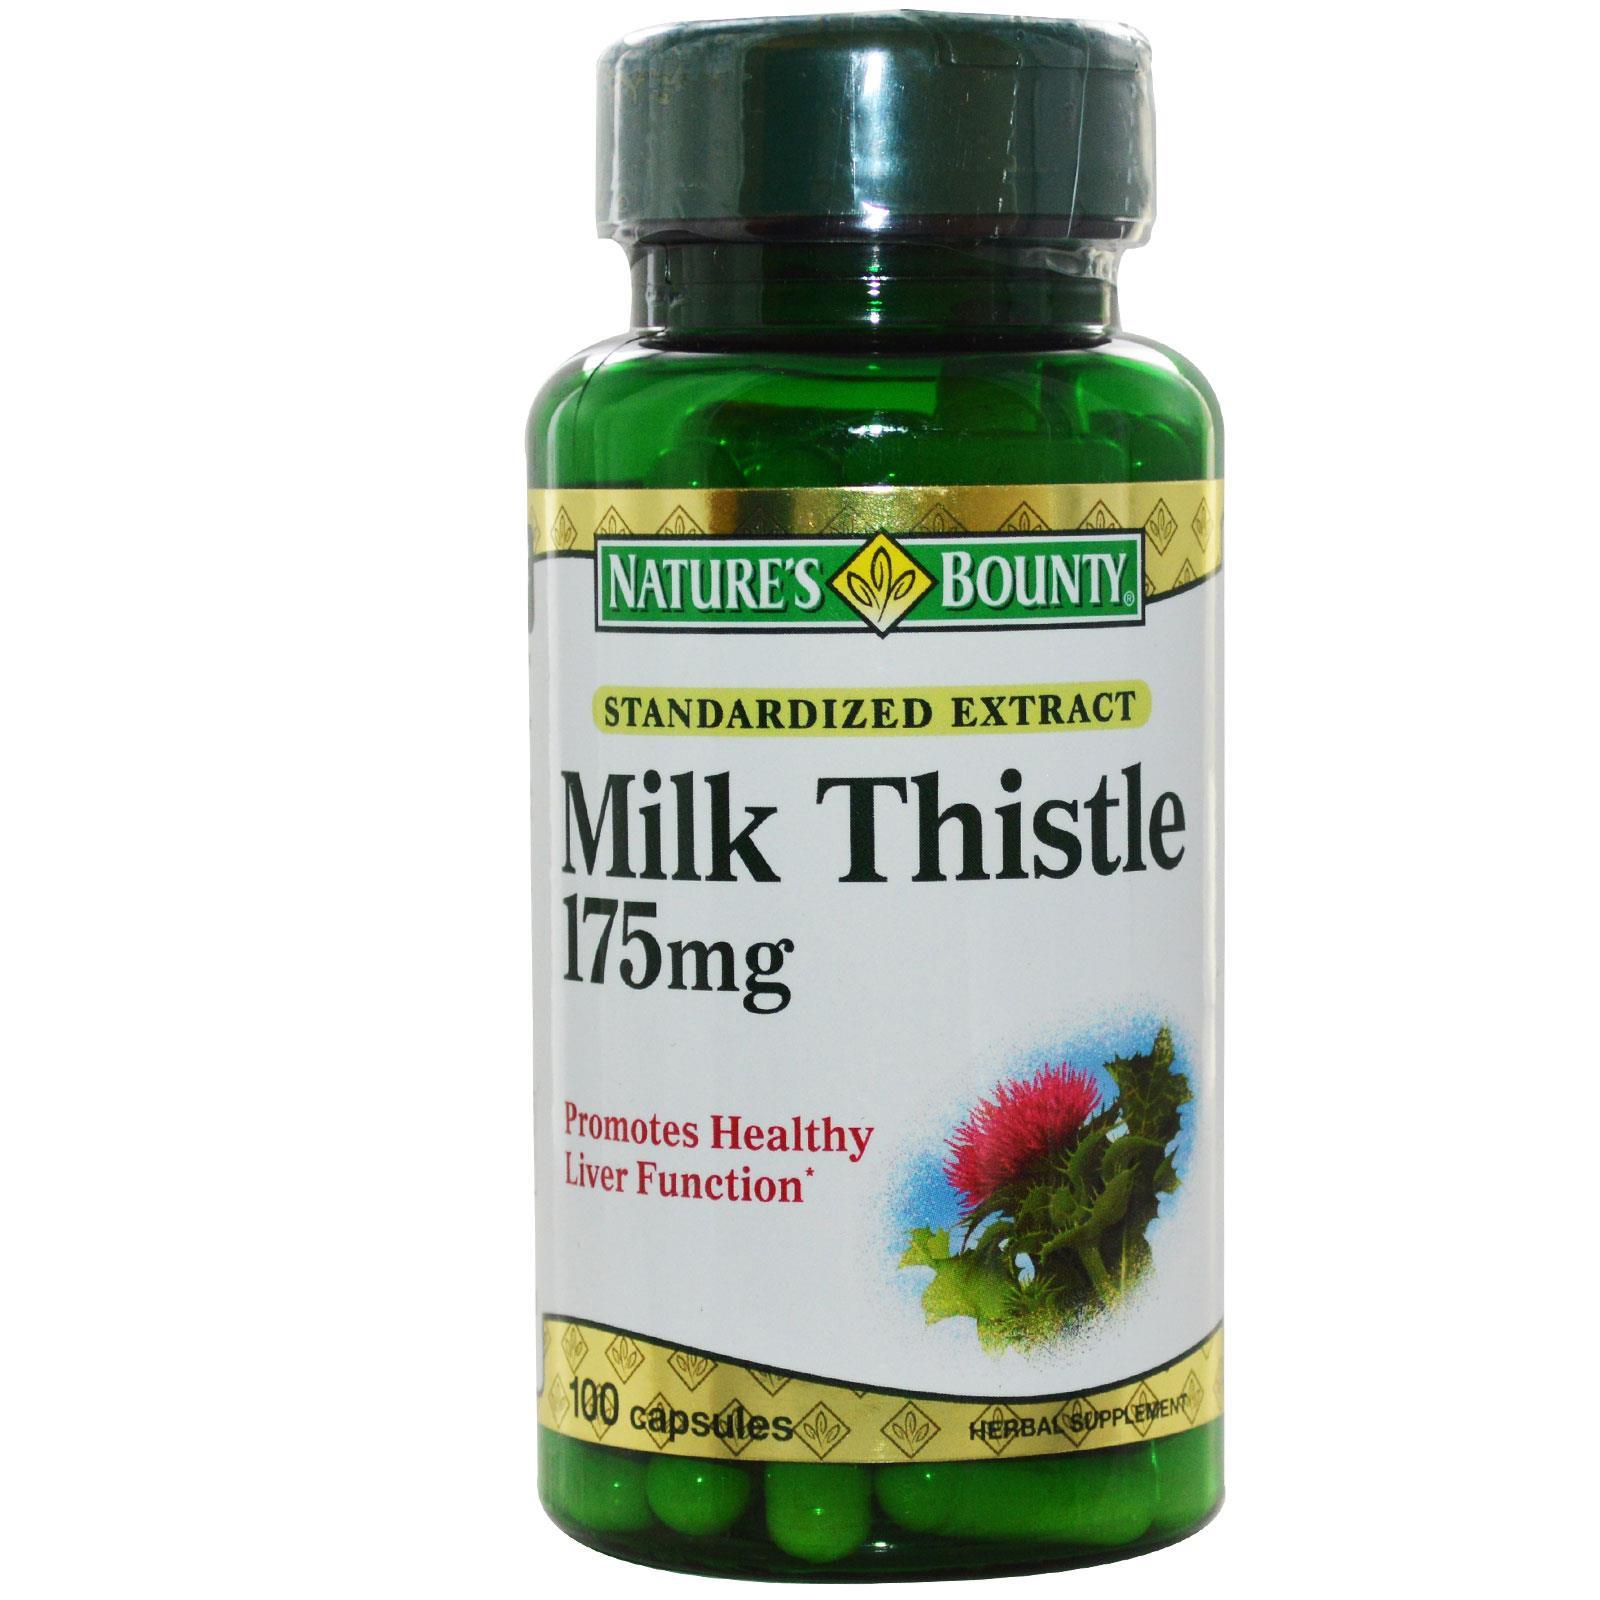 Nature's Bounty Milk Thistle 175 mg 100 Capsules